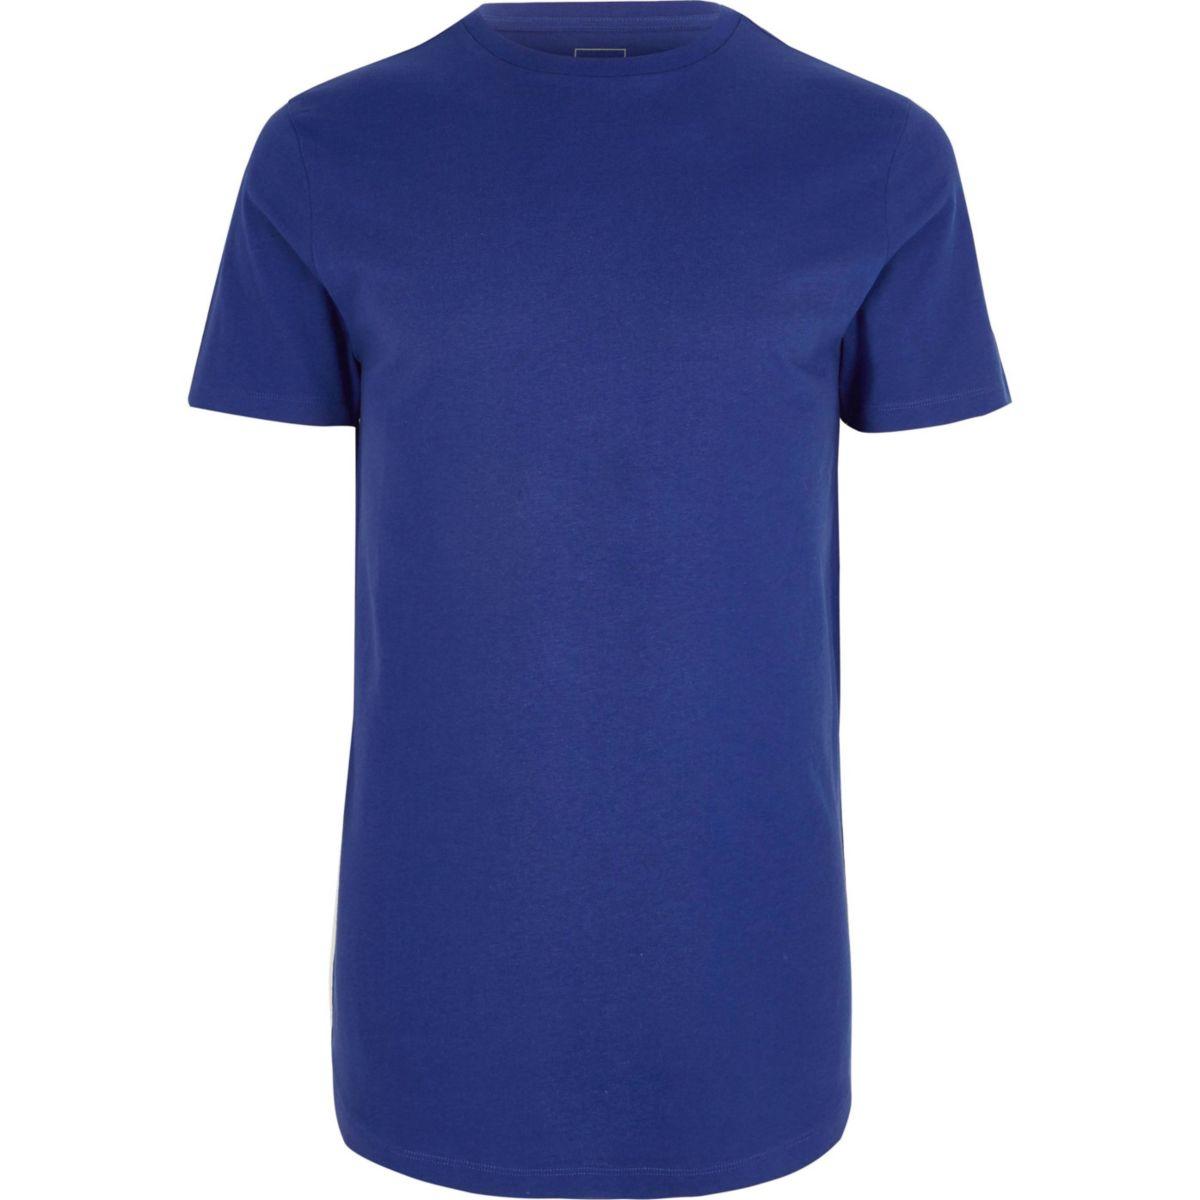 Big and Tall blue curved hem T-shirt